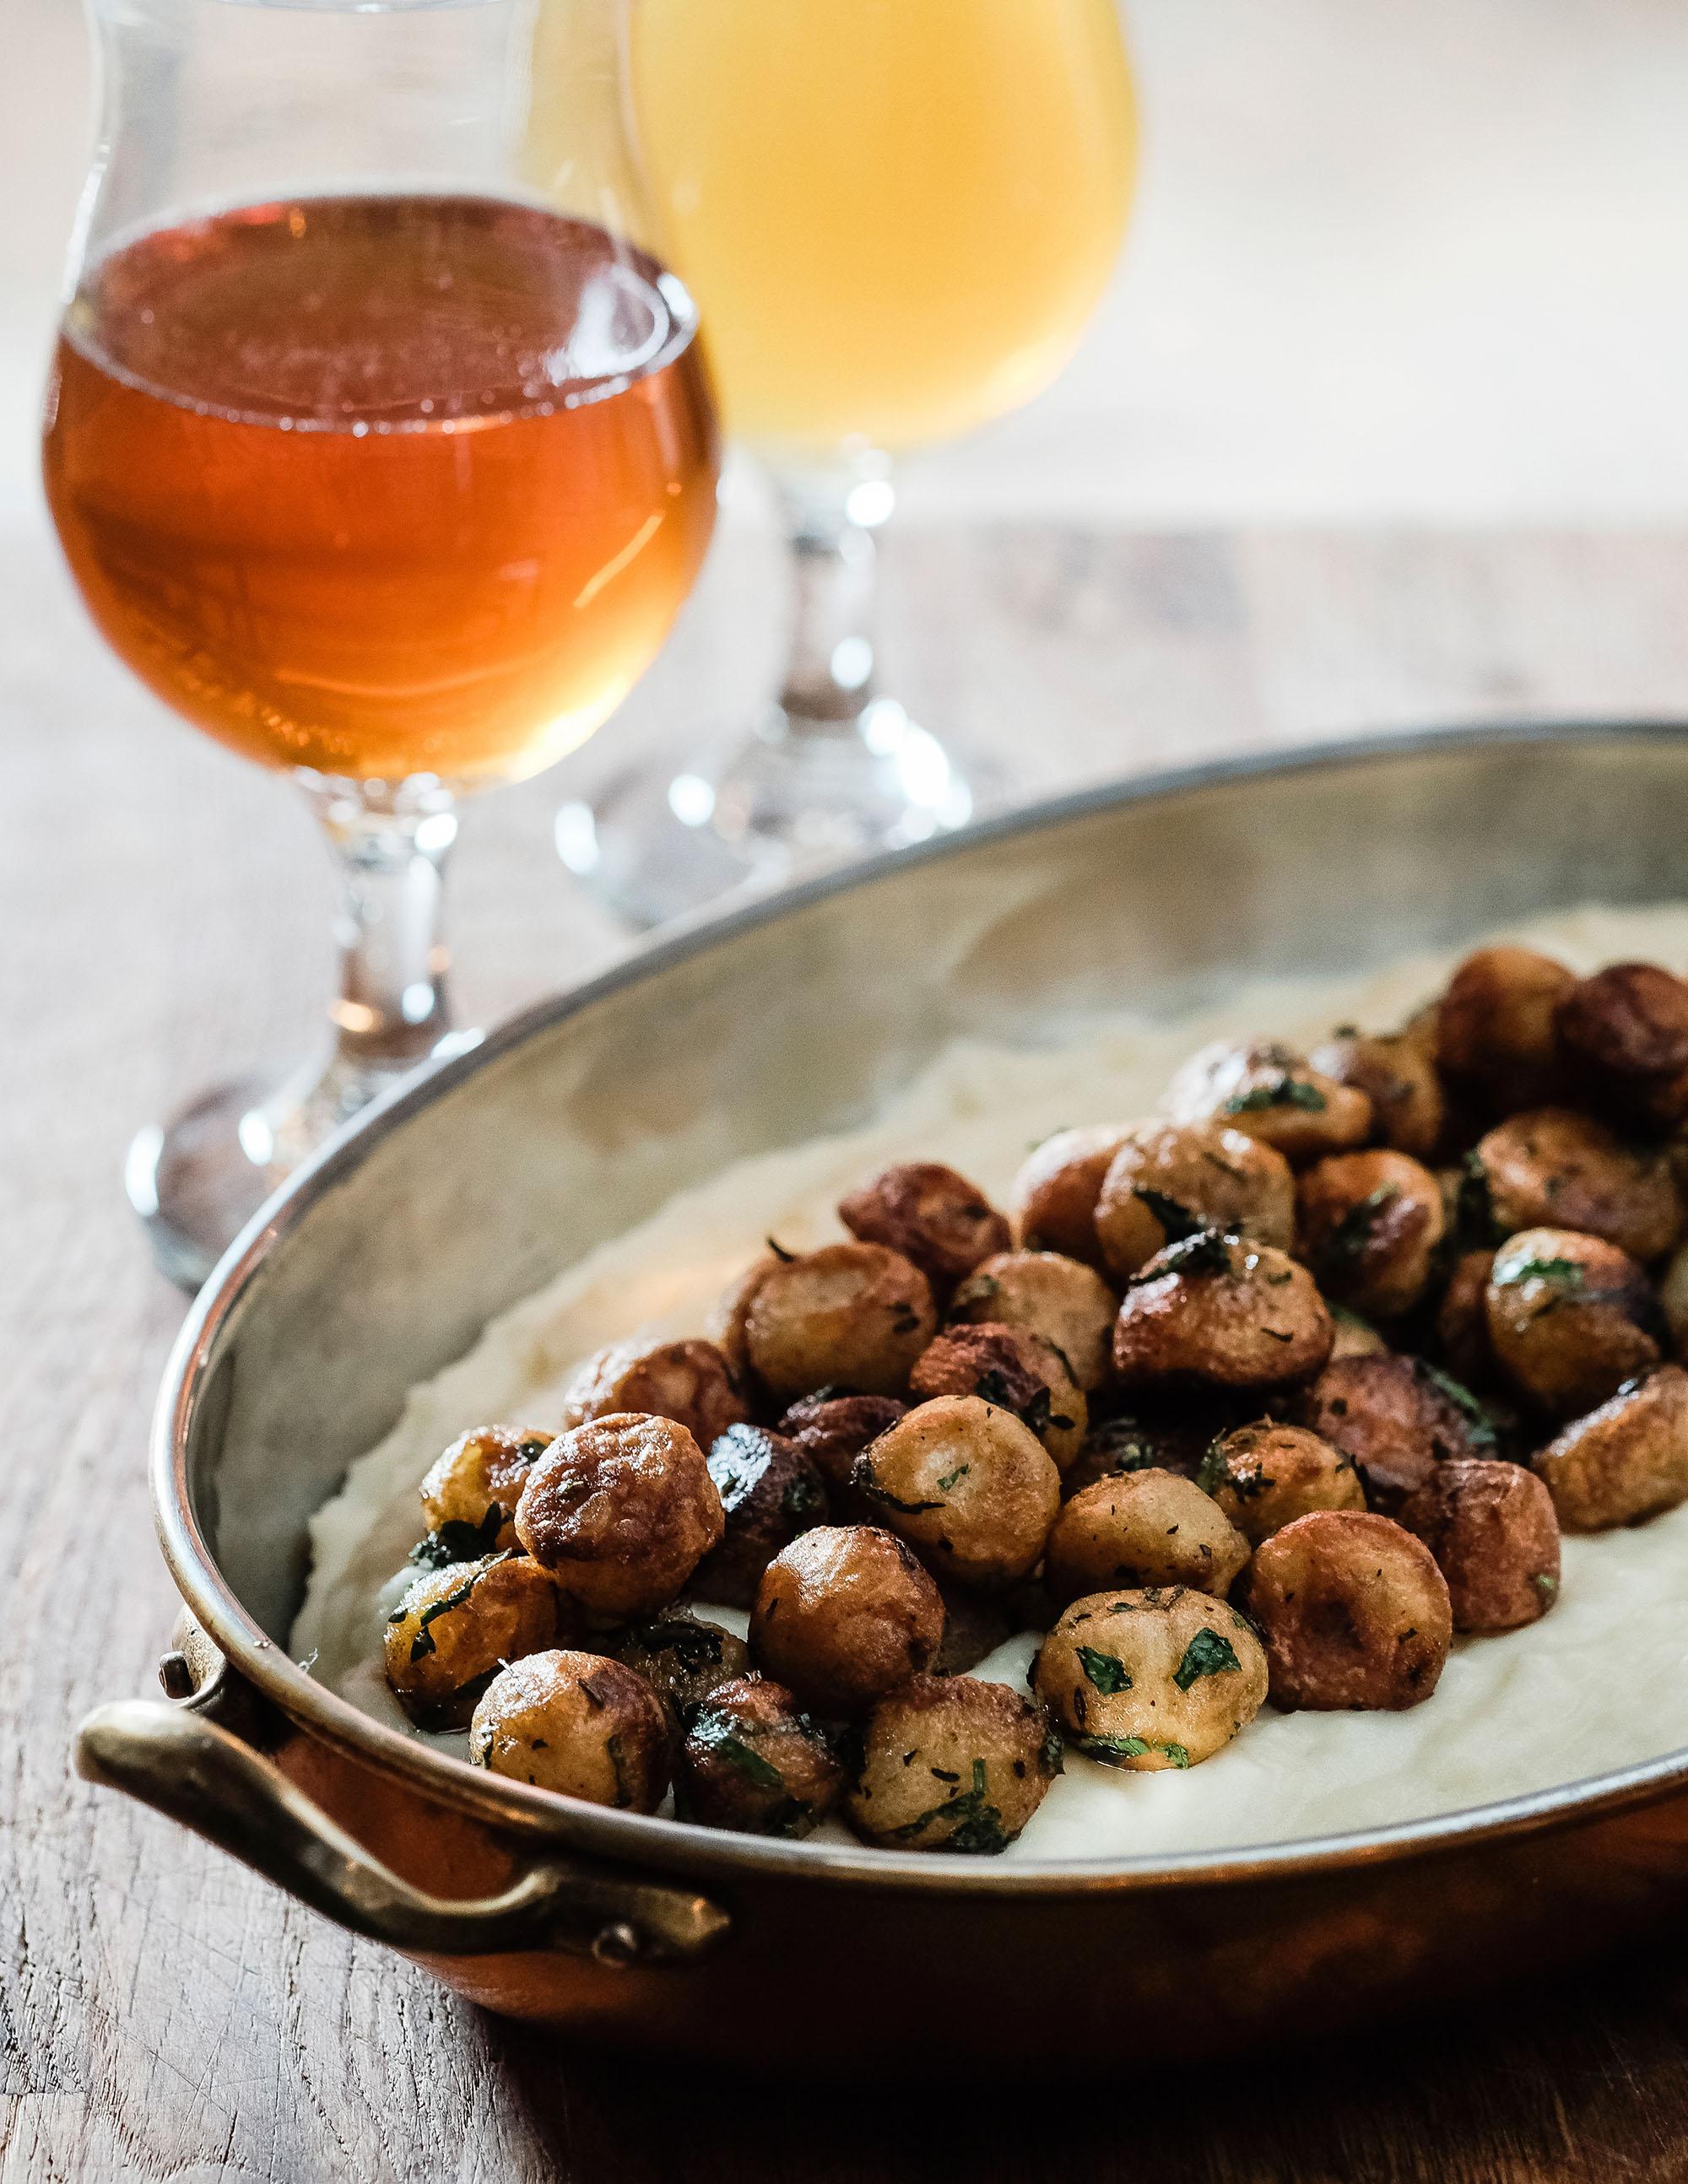 potatoes-noisette-on-potato-puree-su.jpg